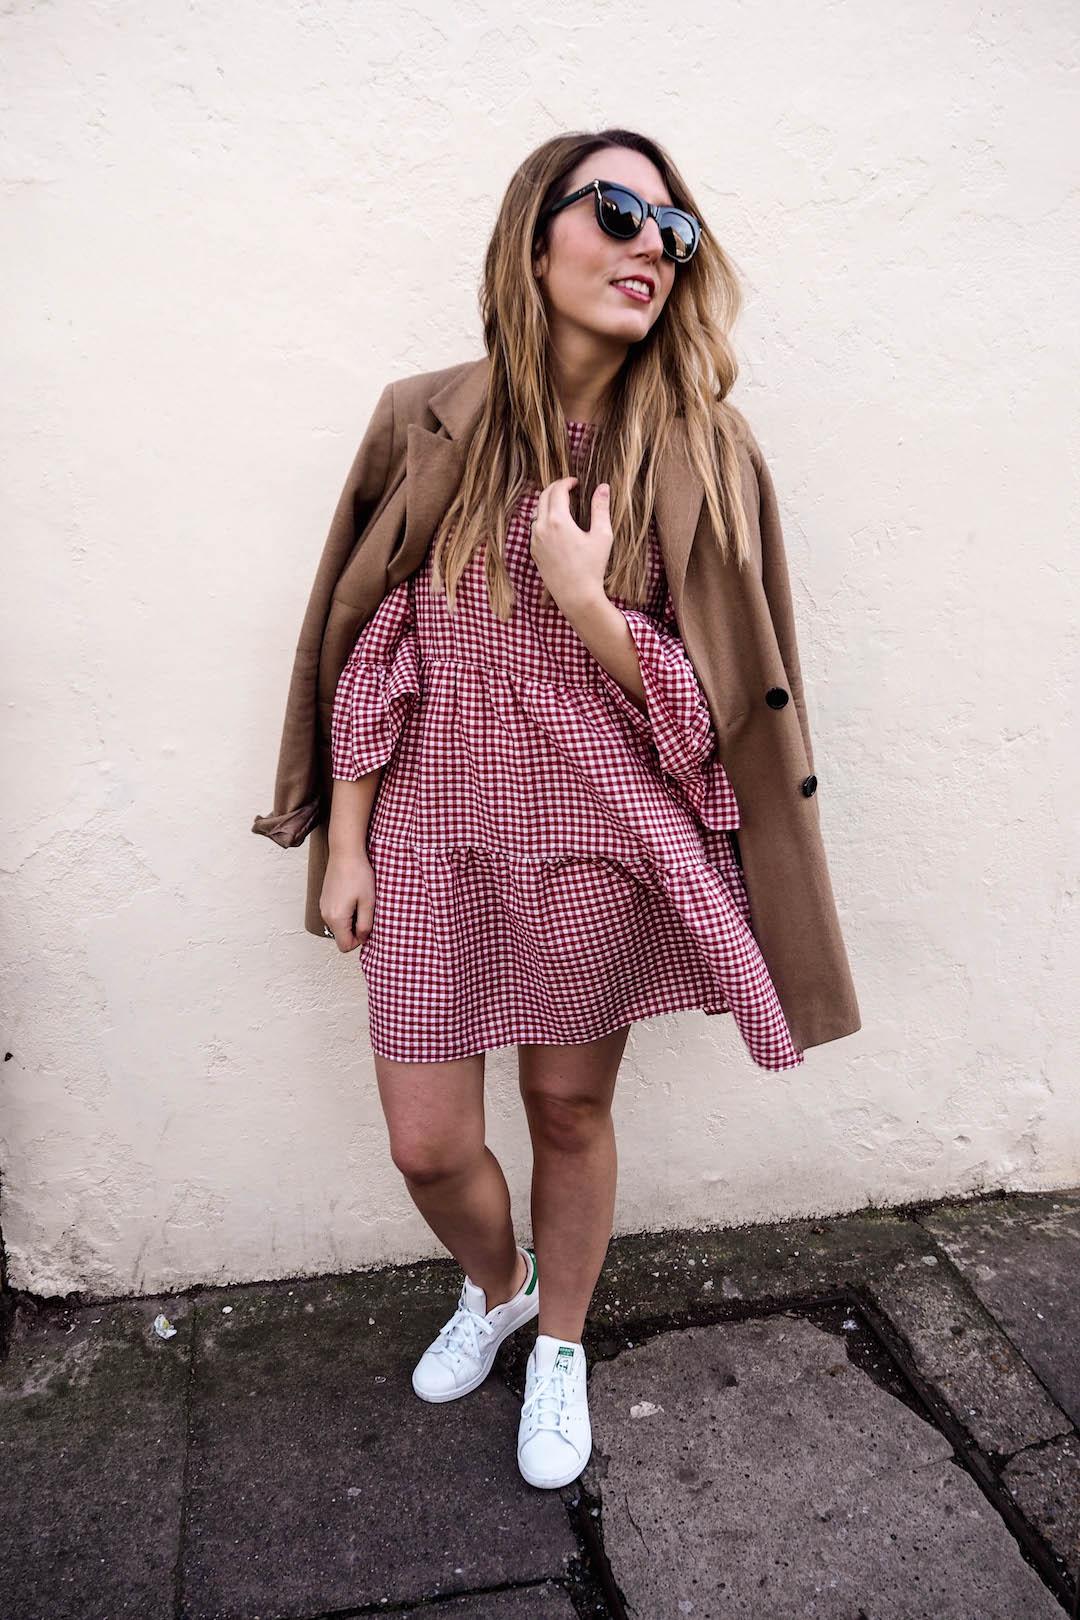 Zara gingham dress | Michael Kors satchel | Adidas white trainers | ASOS camel coat | Wolf & Stag